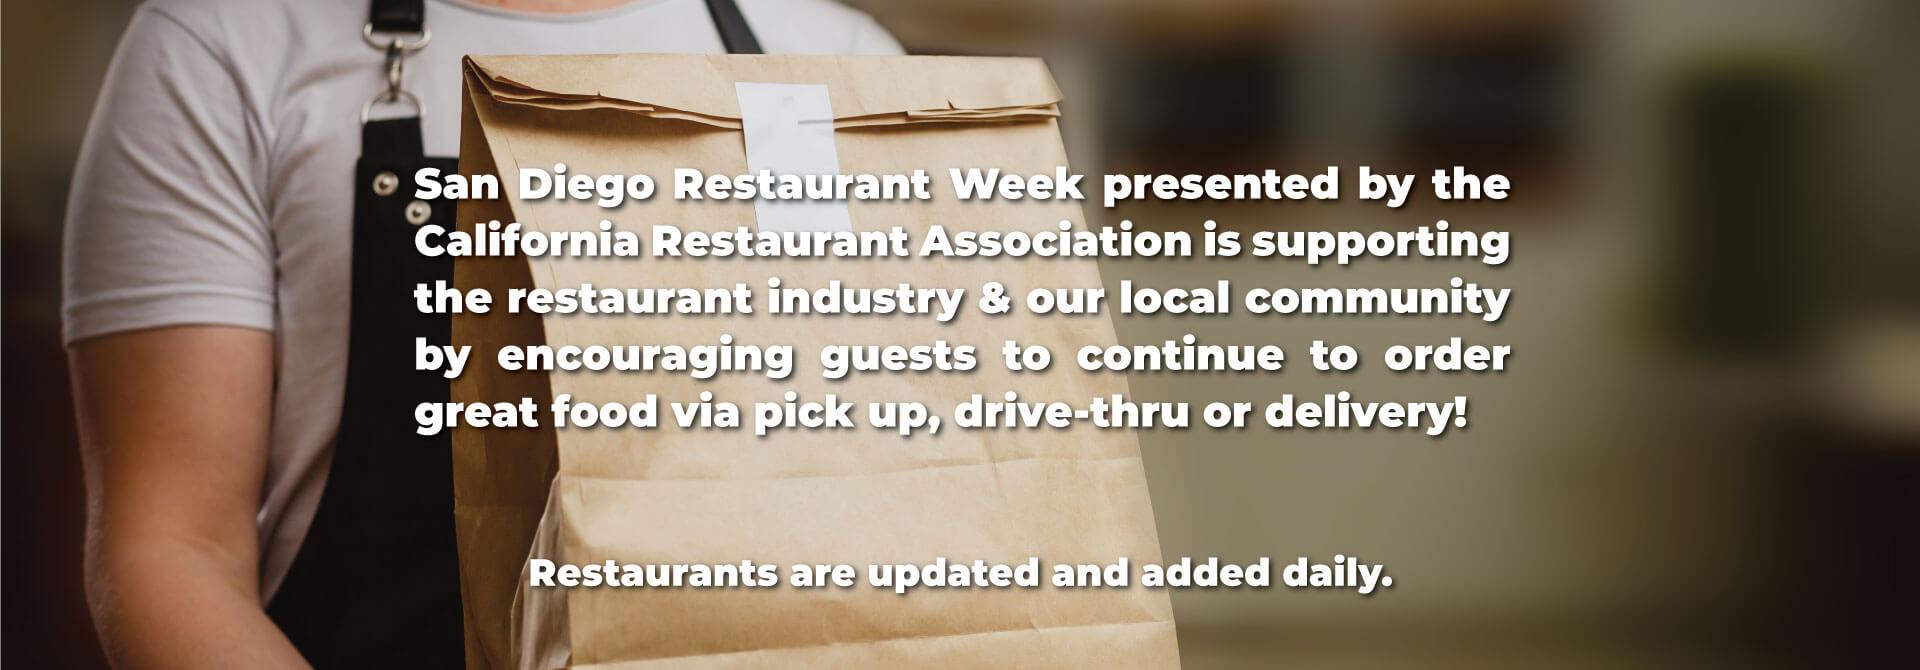 SDRW2020_tempweb-1 san diego restaurant week